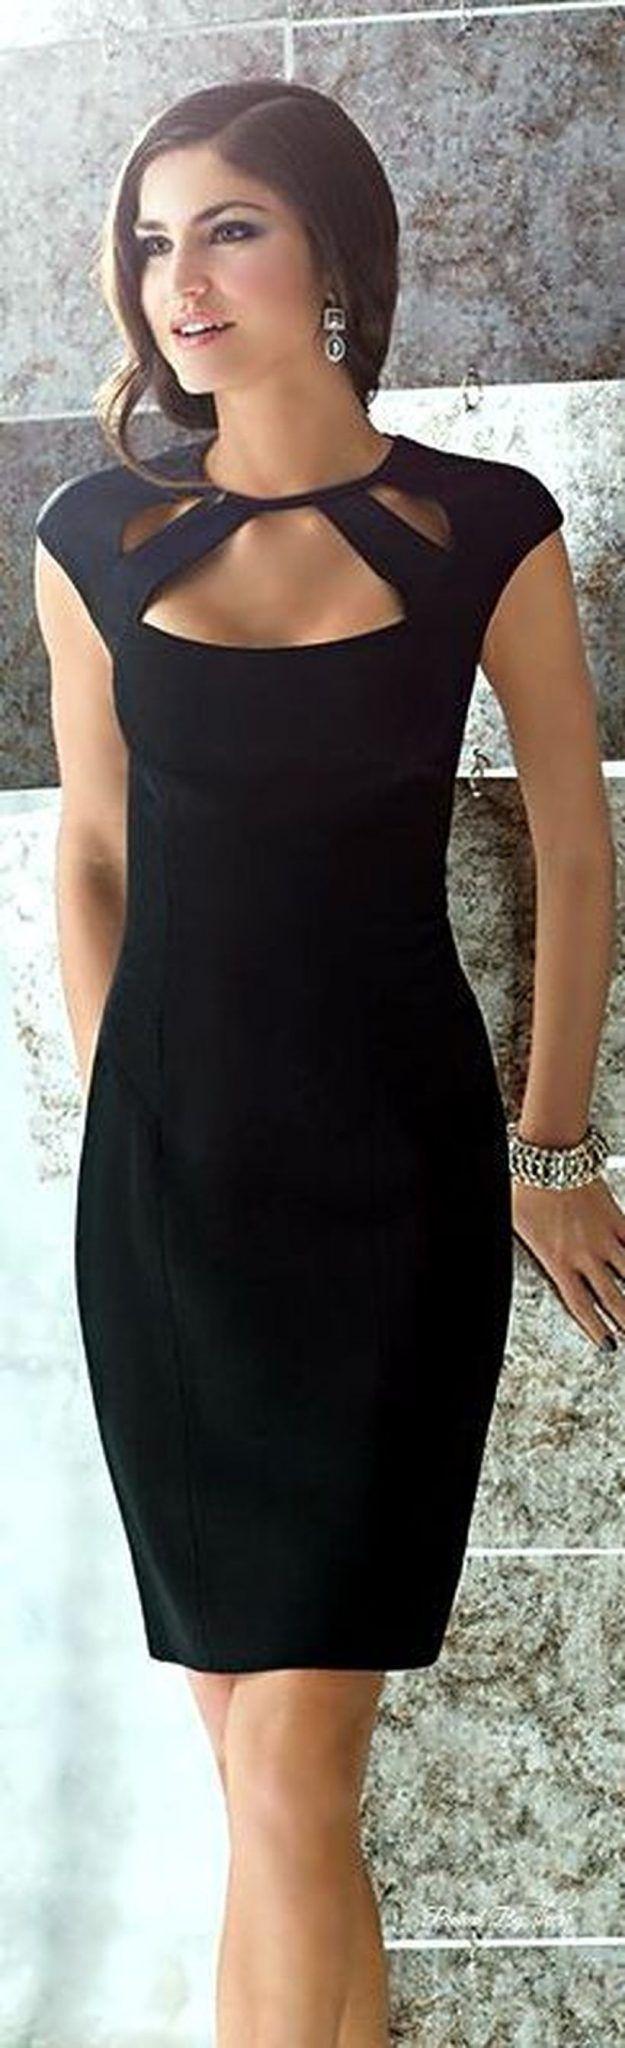 50 gorgeous elegant black dress outfit style | clothes, black